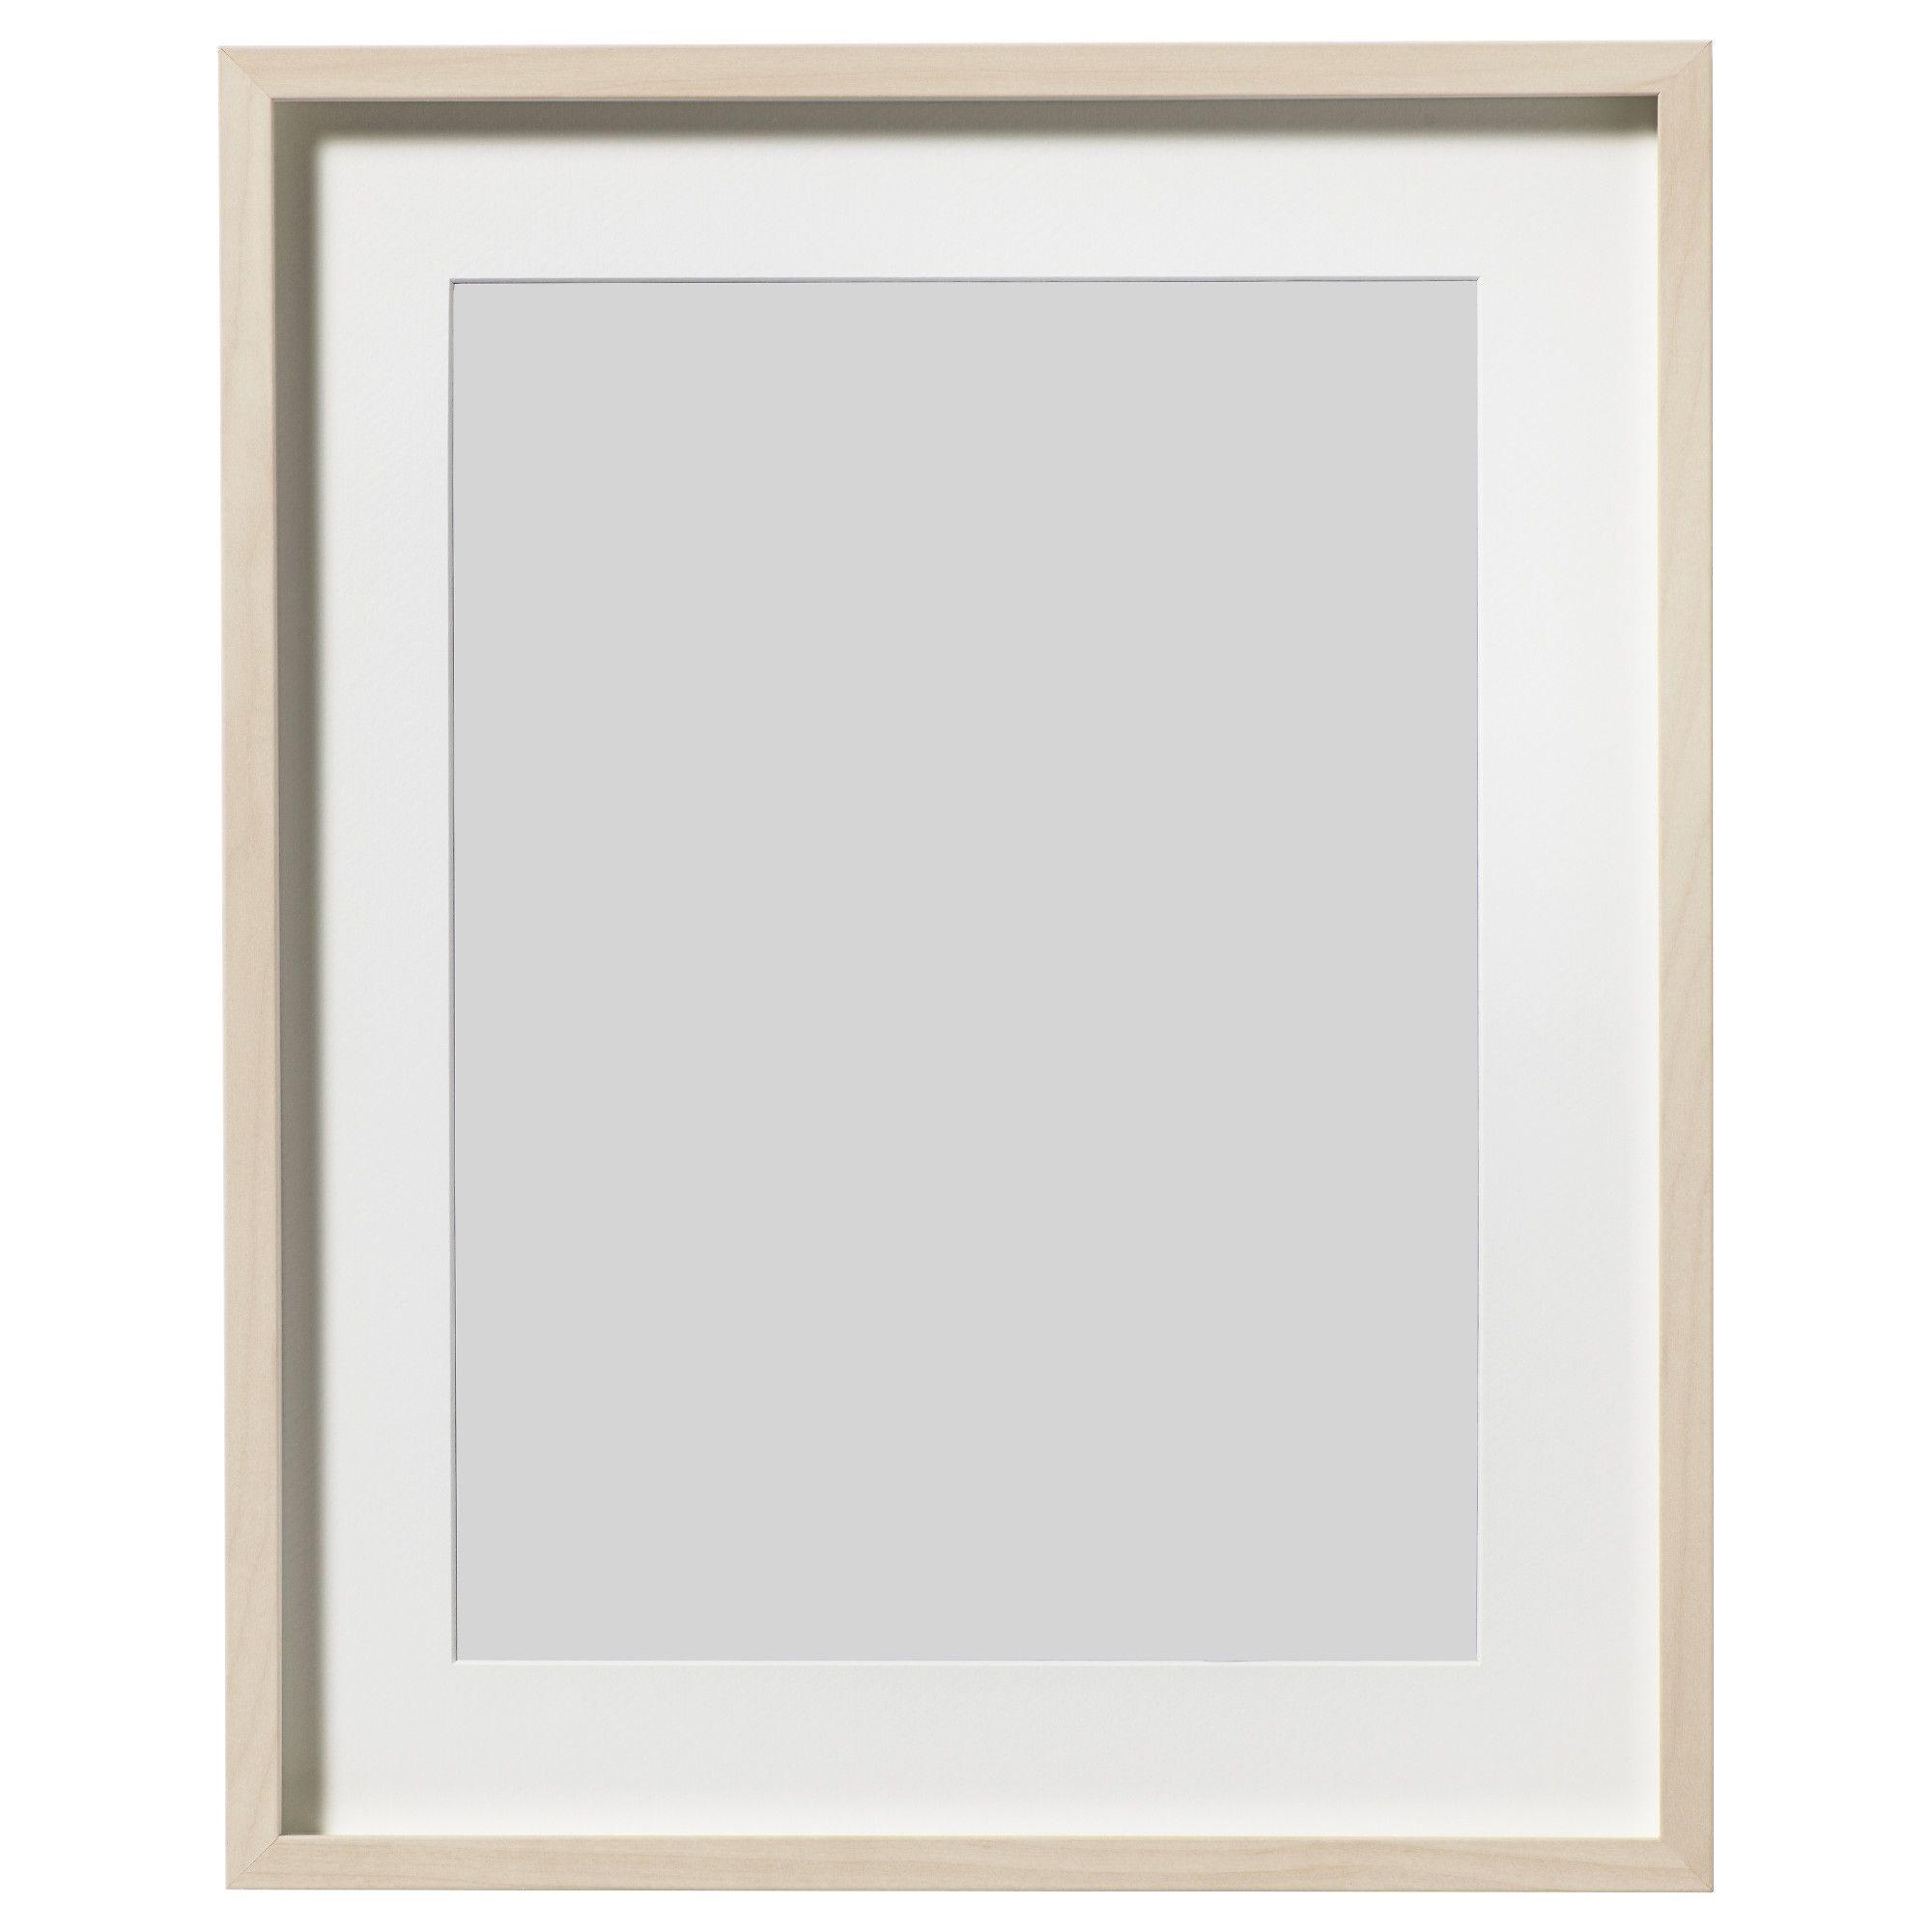 Hovsta Cadre Motif Bouleau Bouleau 40x50 Cm Ikea Frame Wall Frames Wall Decor Pictures